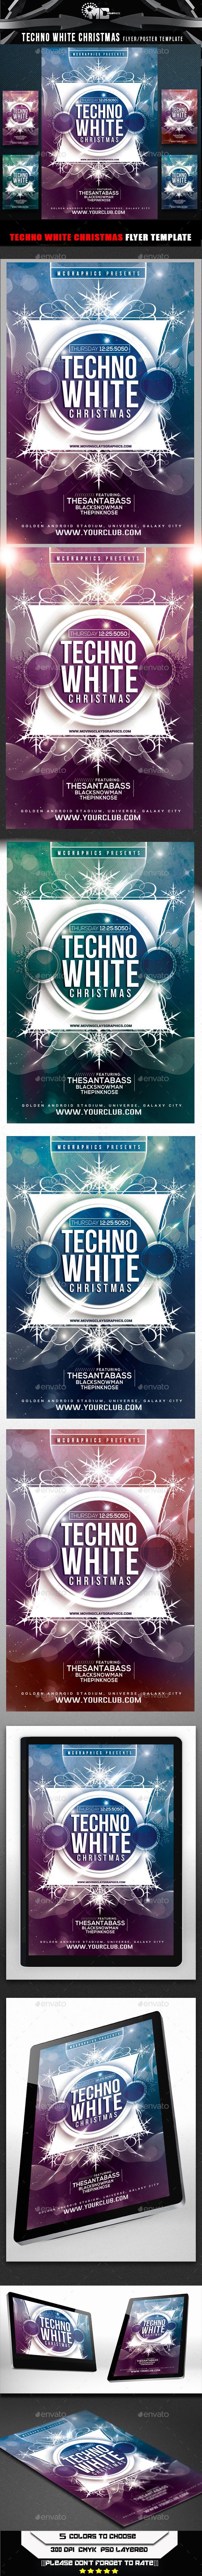 Techno White Christmas Flyer Template - Flyers Print Templates